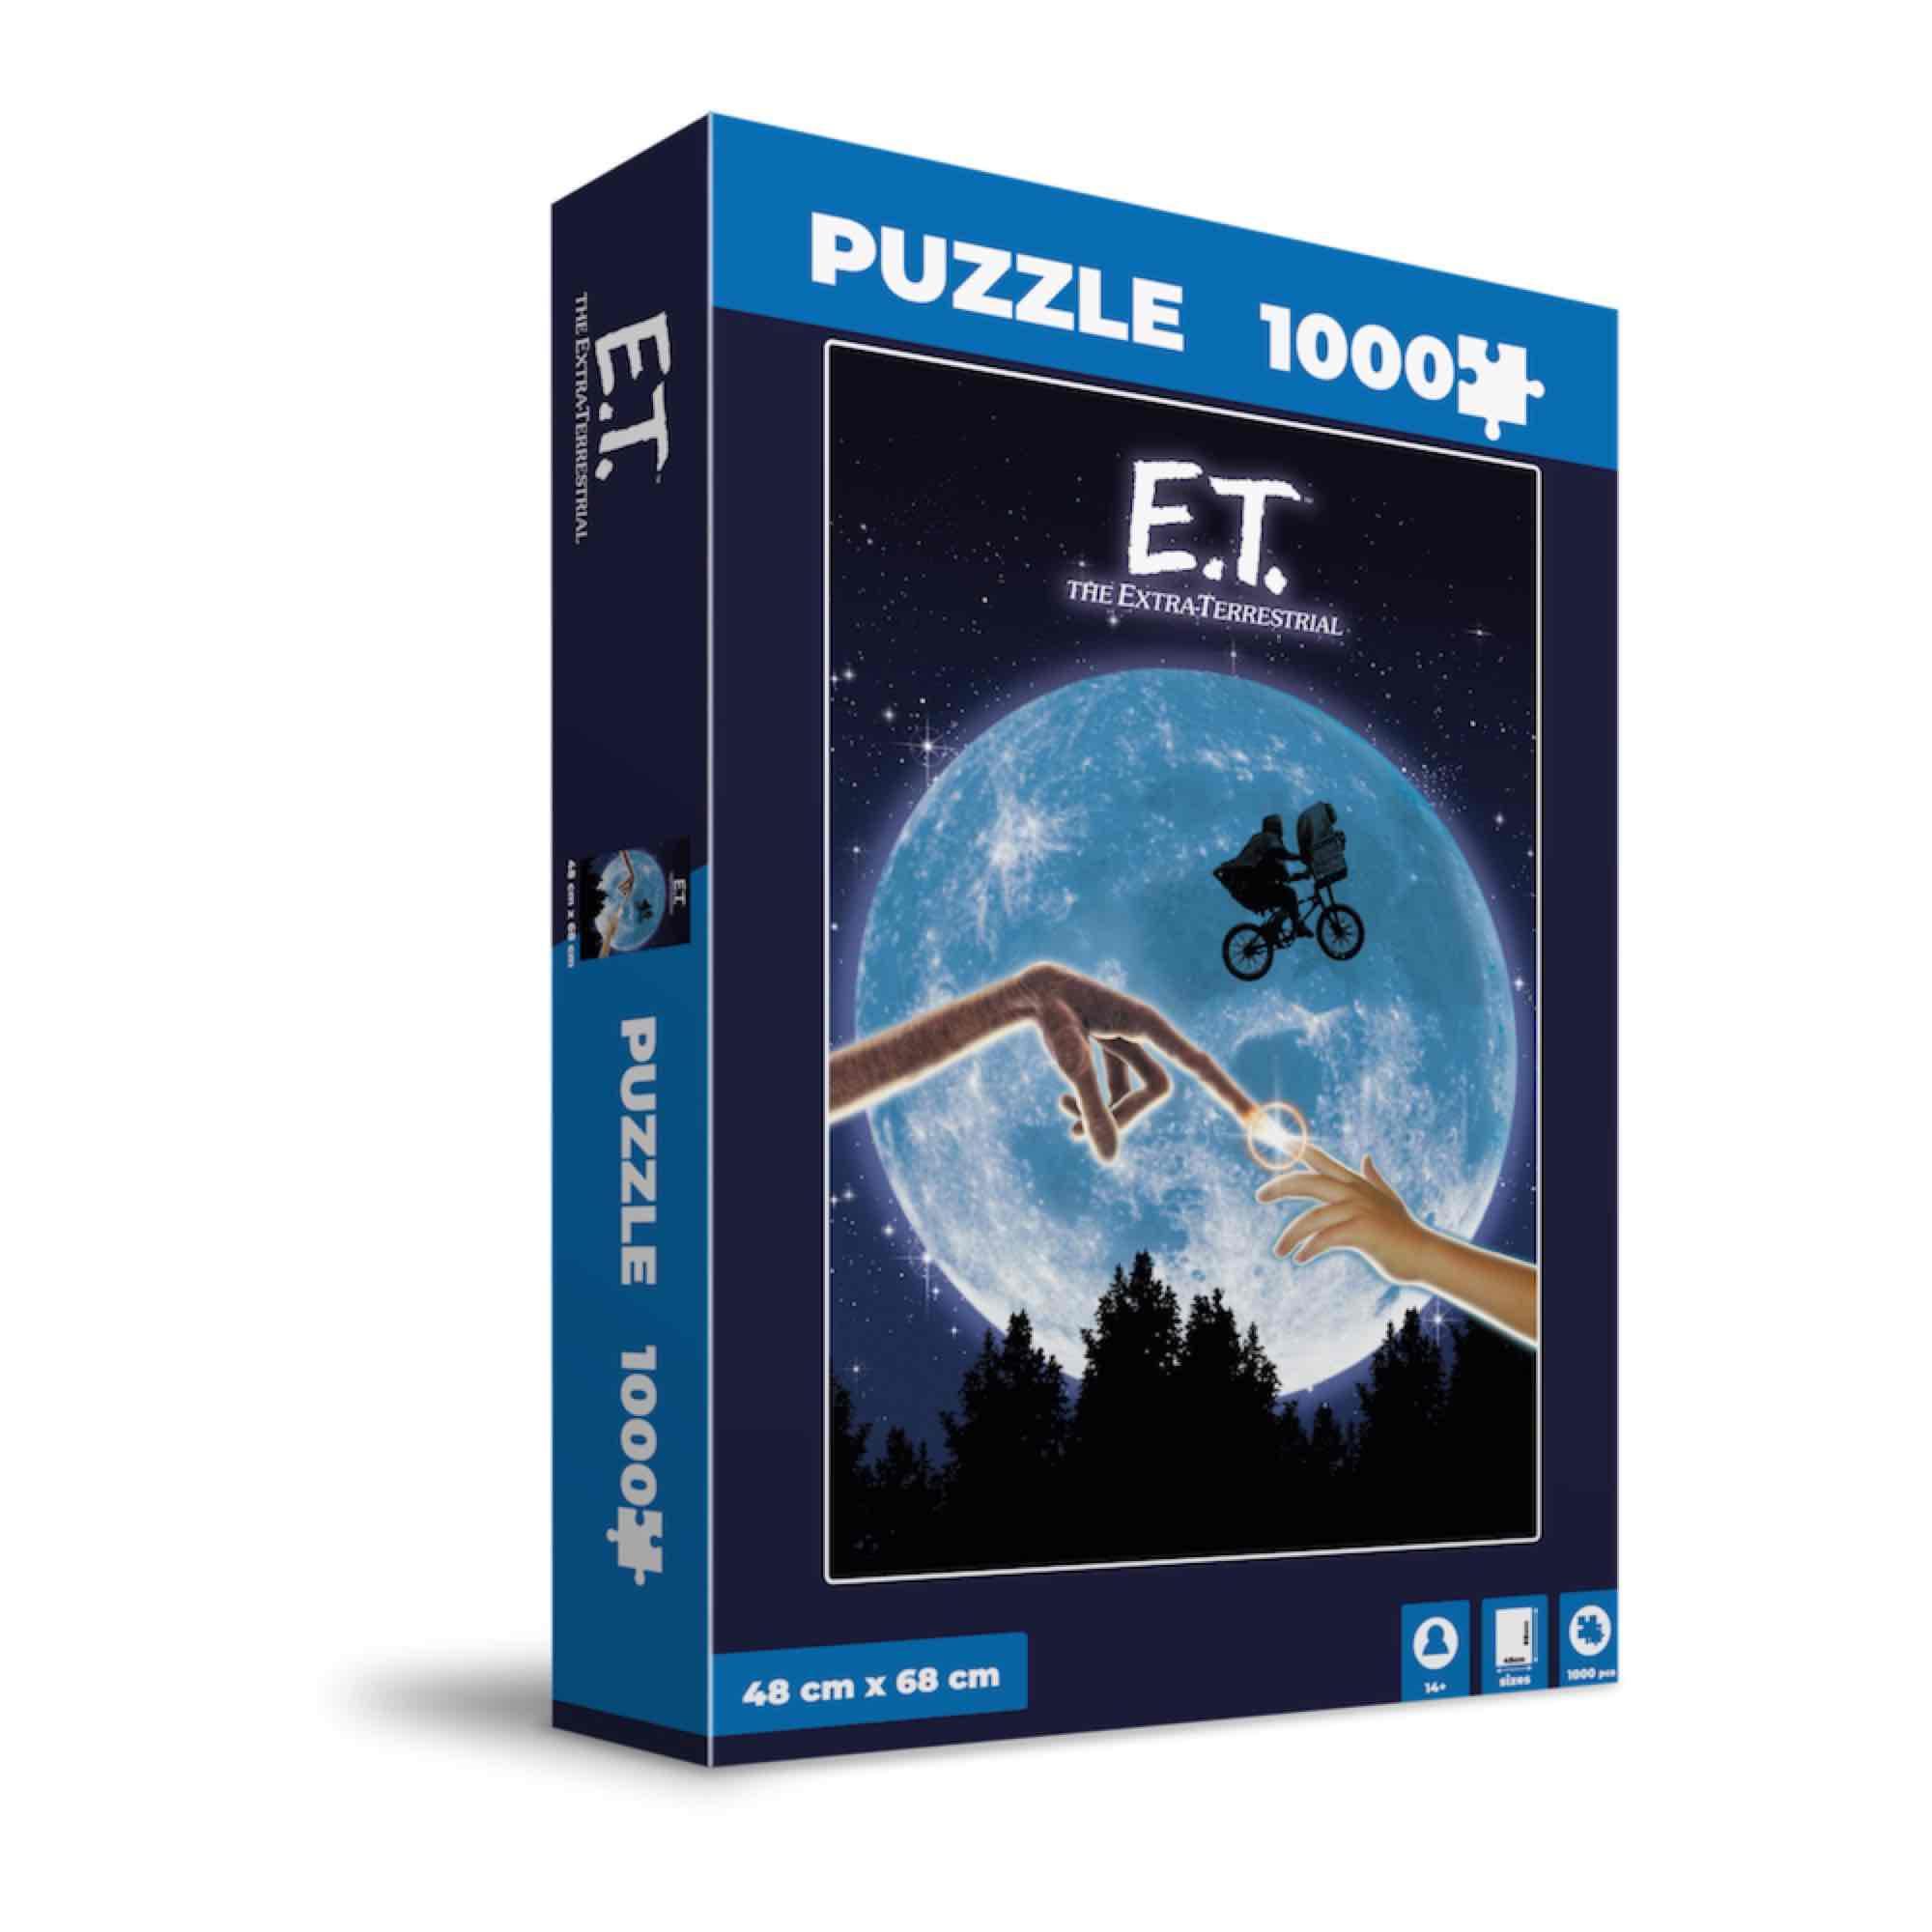 E.T. POSTER PELICULA PUZLE E.T.